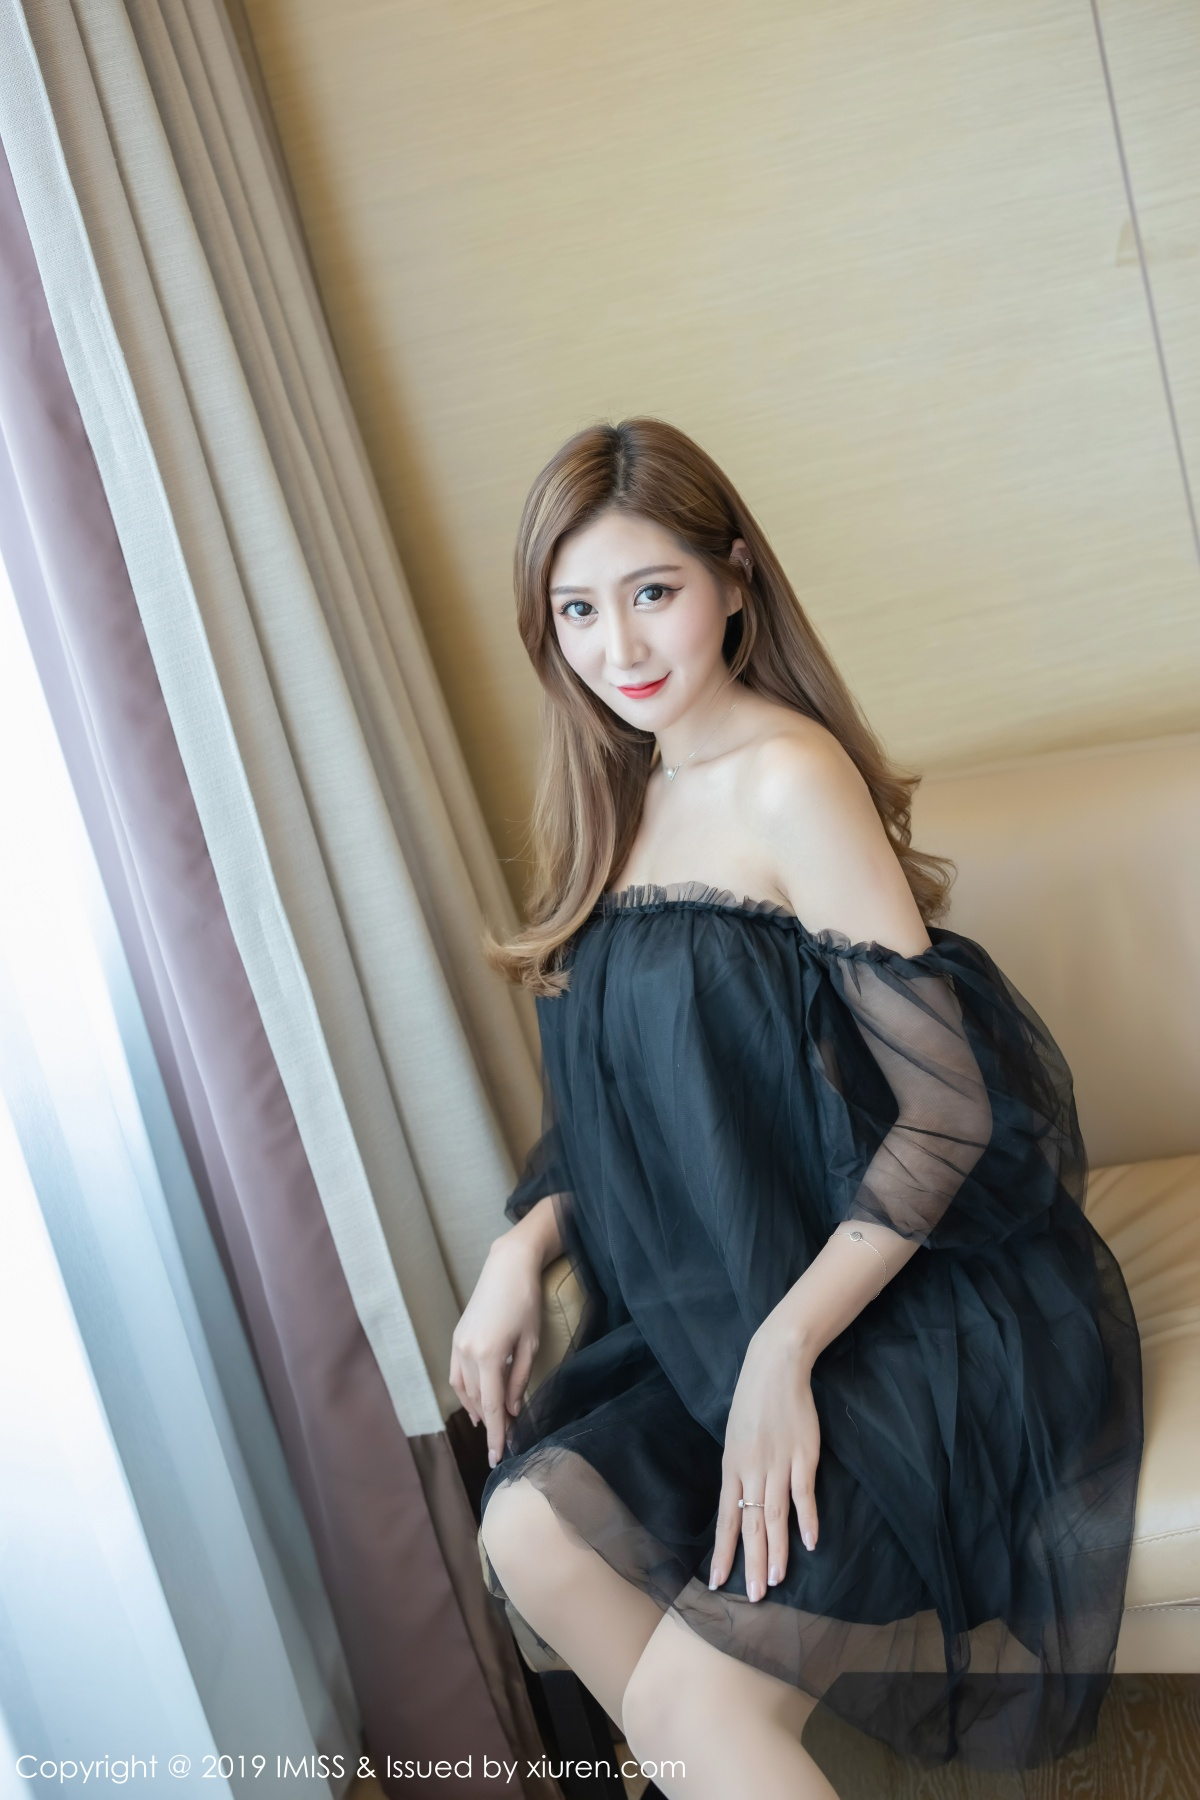 爱蜜社 [IMISS] 2019.08.12 VOL.369 ceci